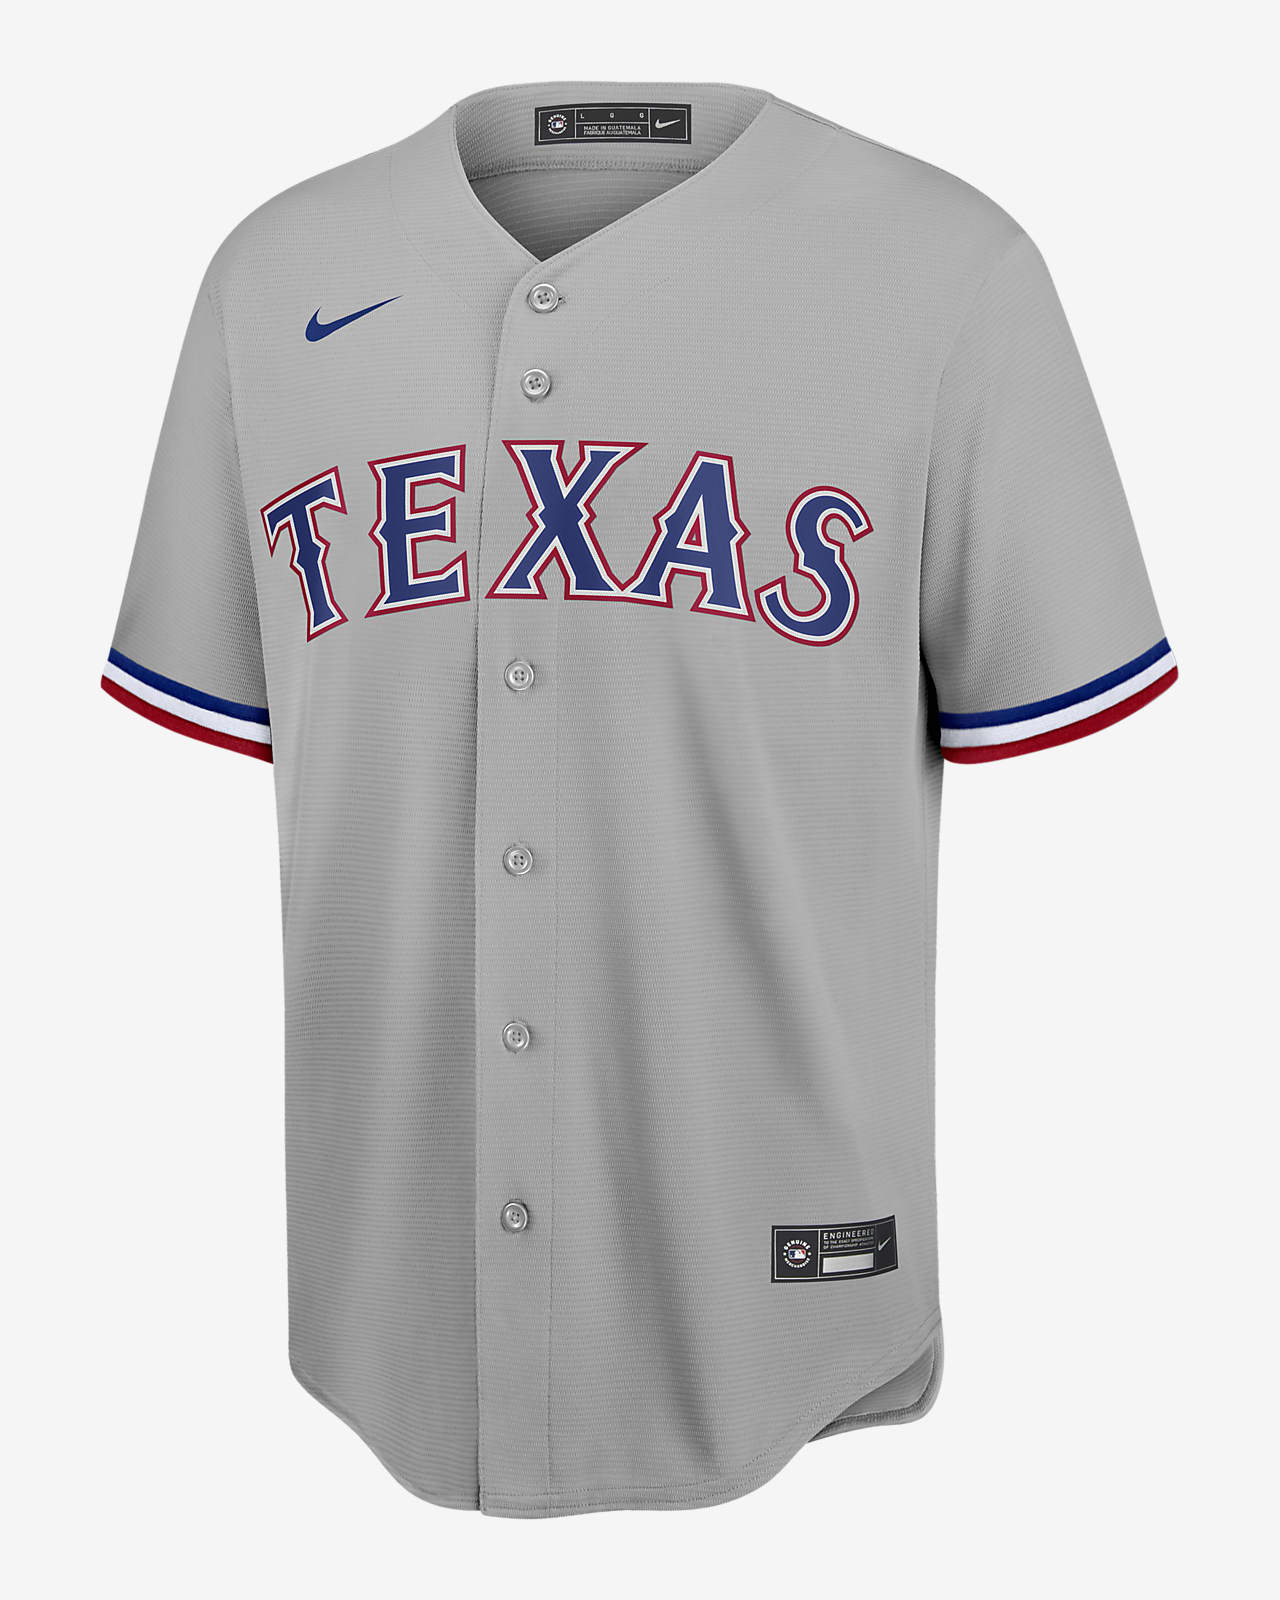 MLB Texas Rangers (Player) Men's Replica Baseball Jersey